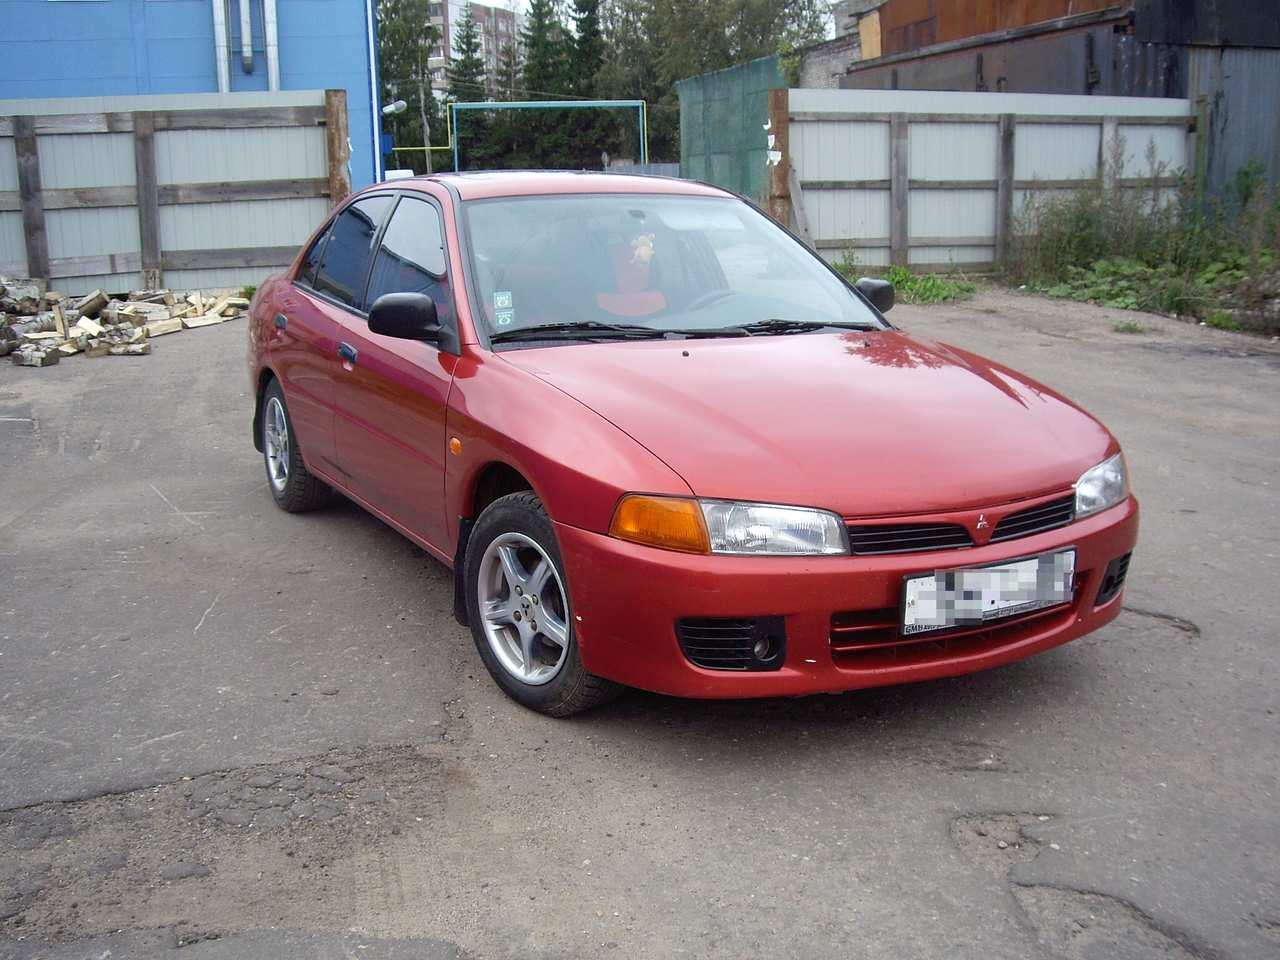 1997 Mitsubishi Lancer Pictures, 1300cc., Gasoline, FF, Automatic For Sale